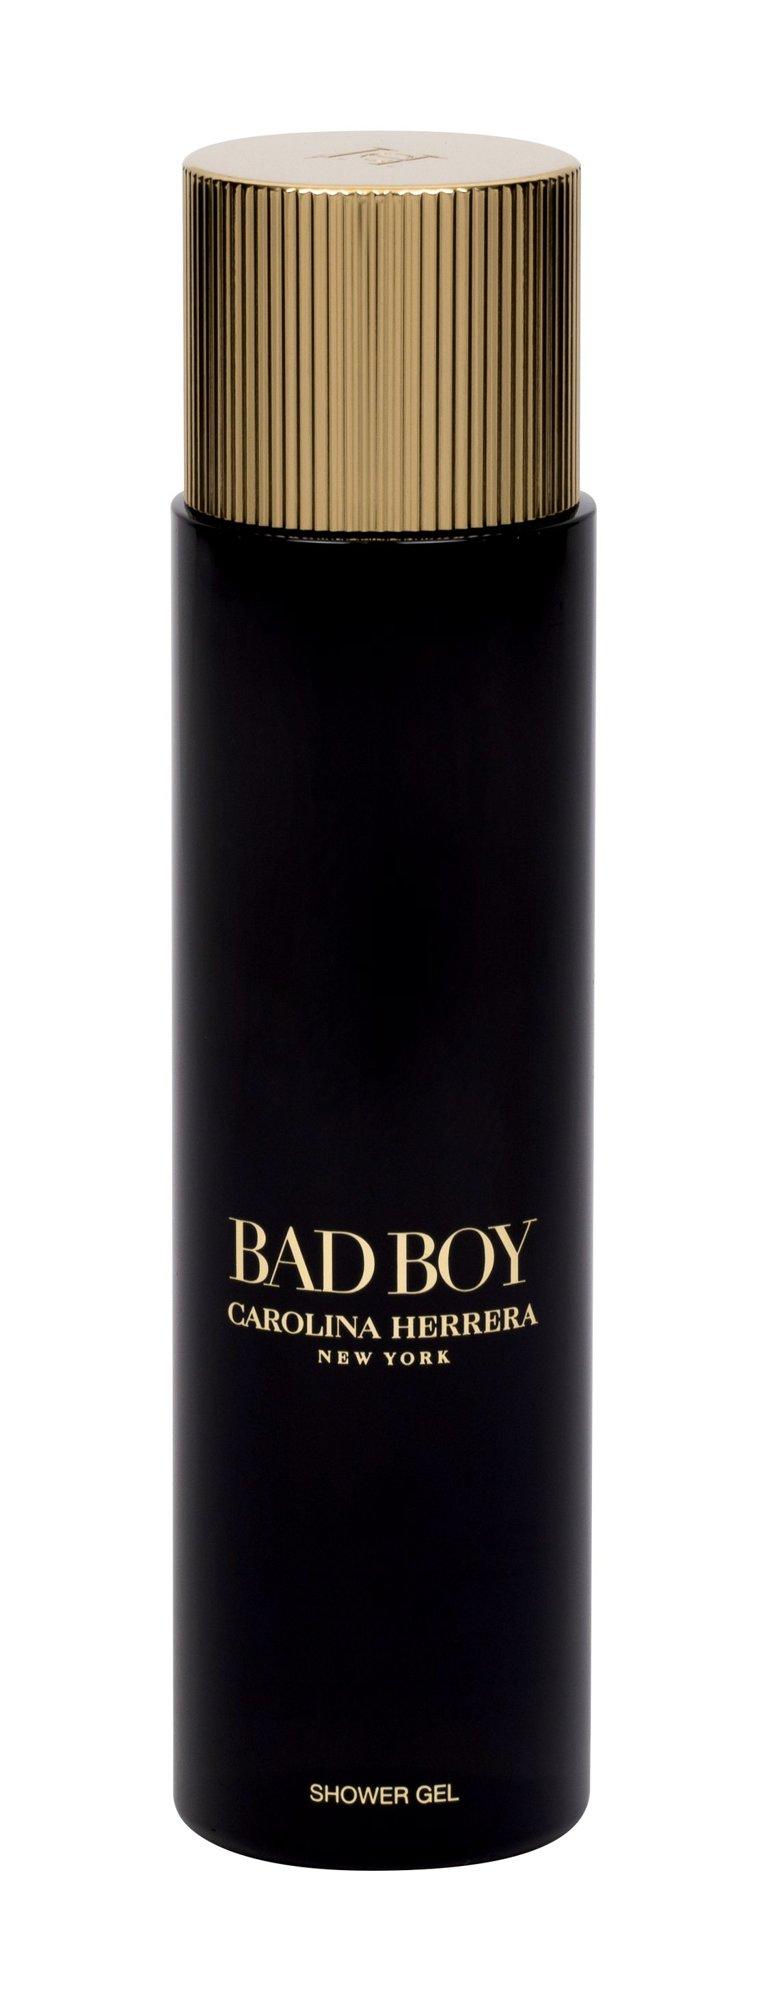 Carolina Herrera Bad Boy Shower Gel 200ml